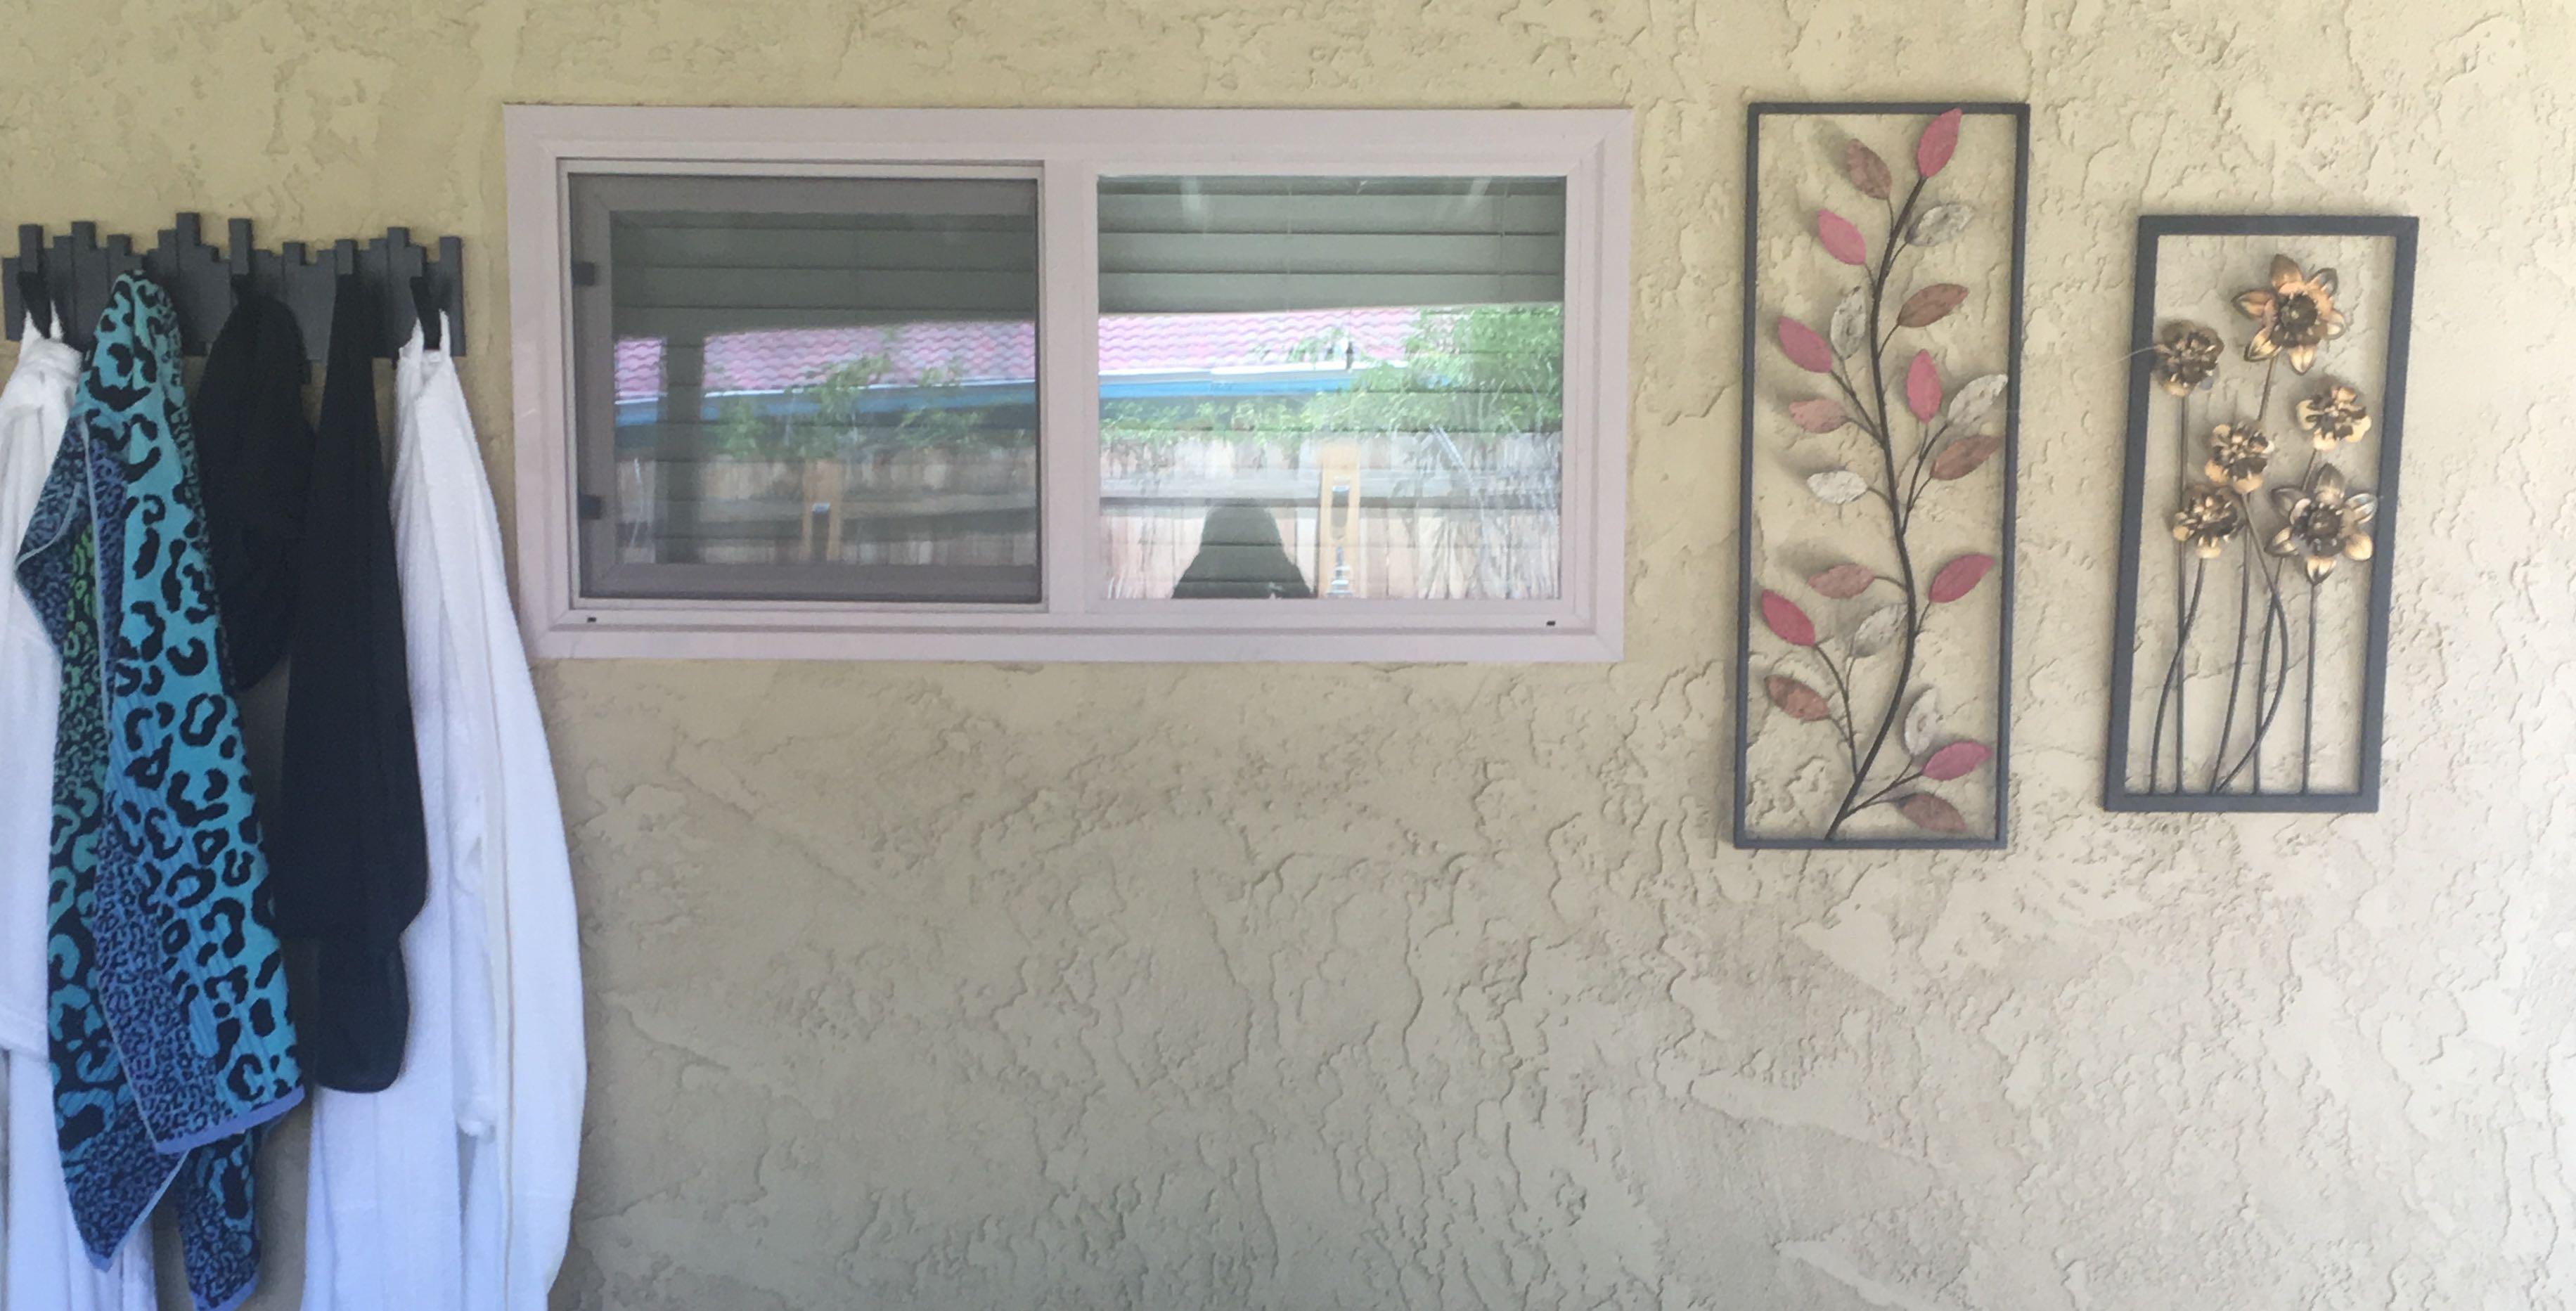 Outdoor Living Spaces | Popupbackpacker Within Burlington Coat Factory Wall Art (Image 18 of 20)